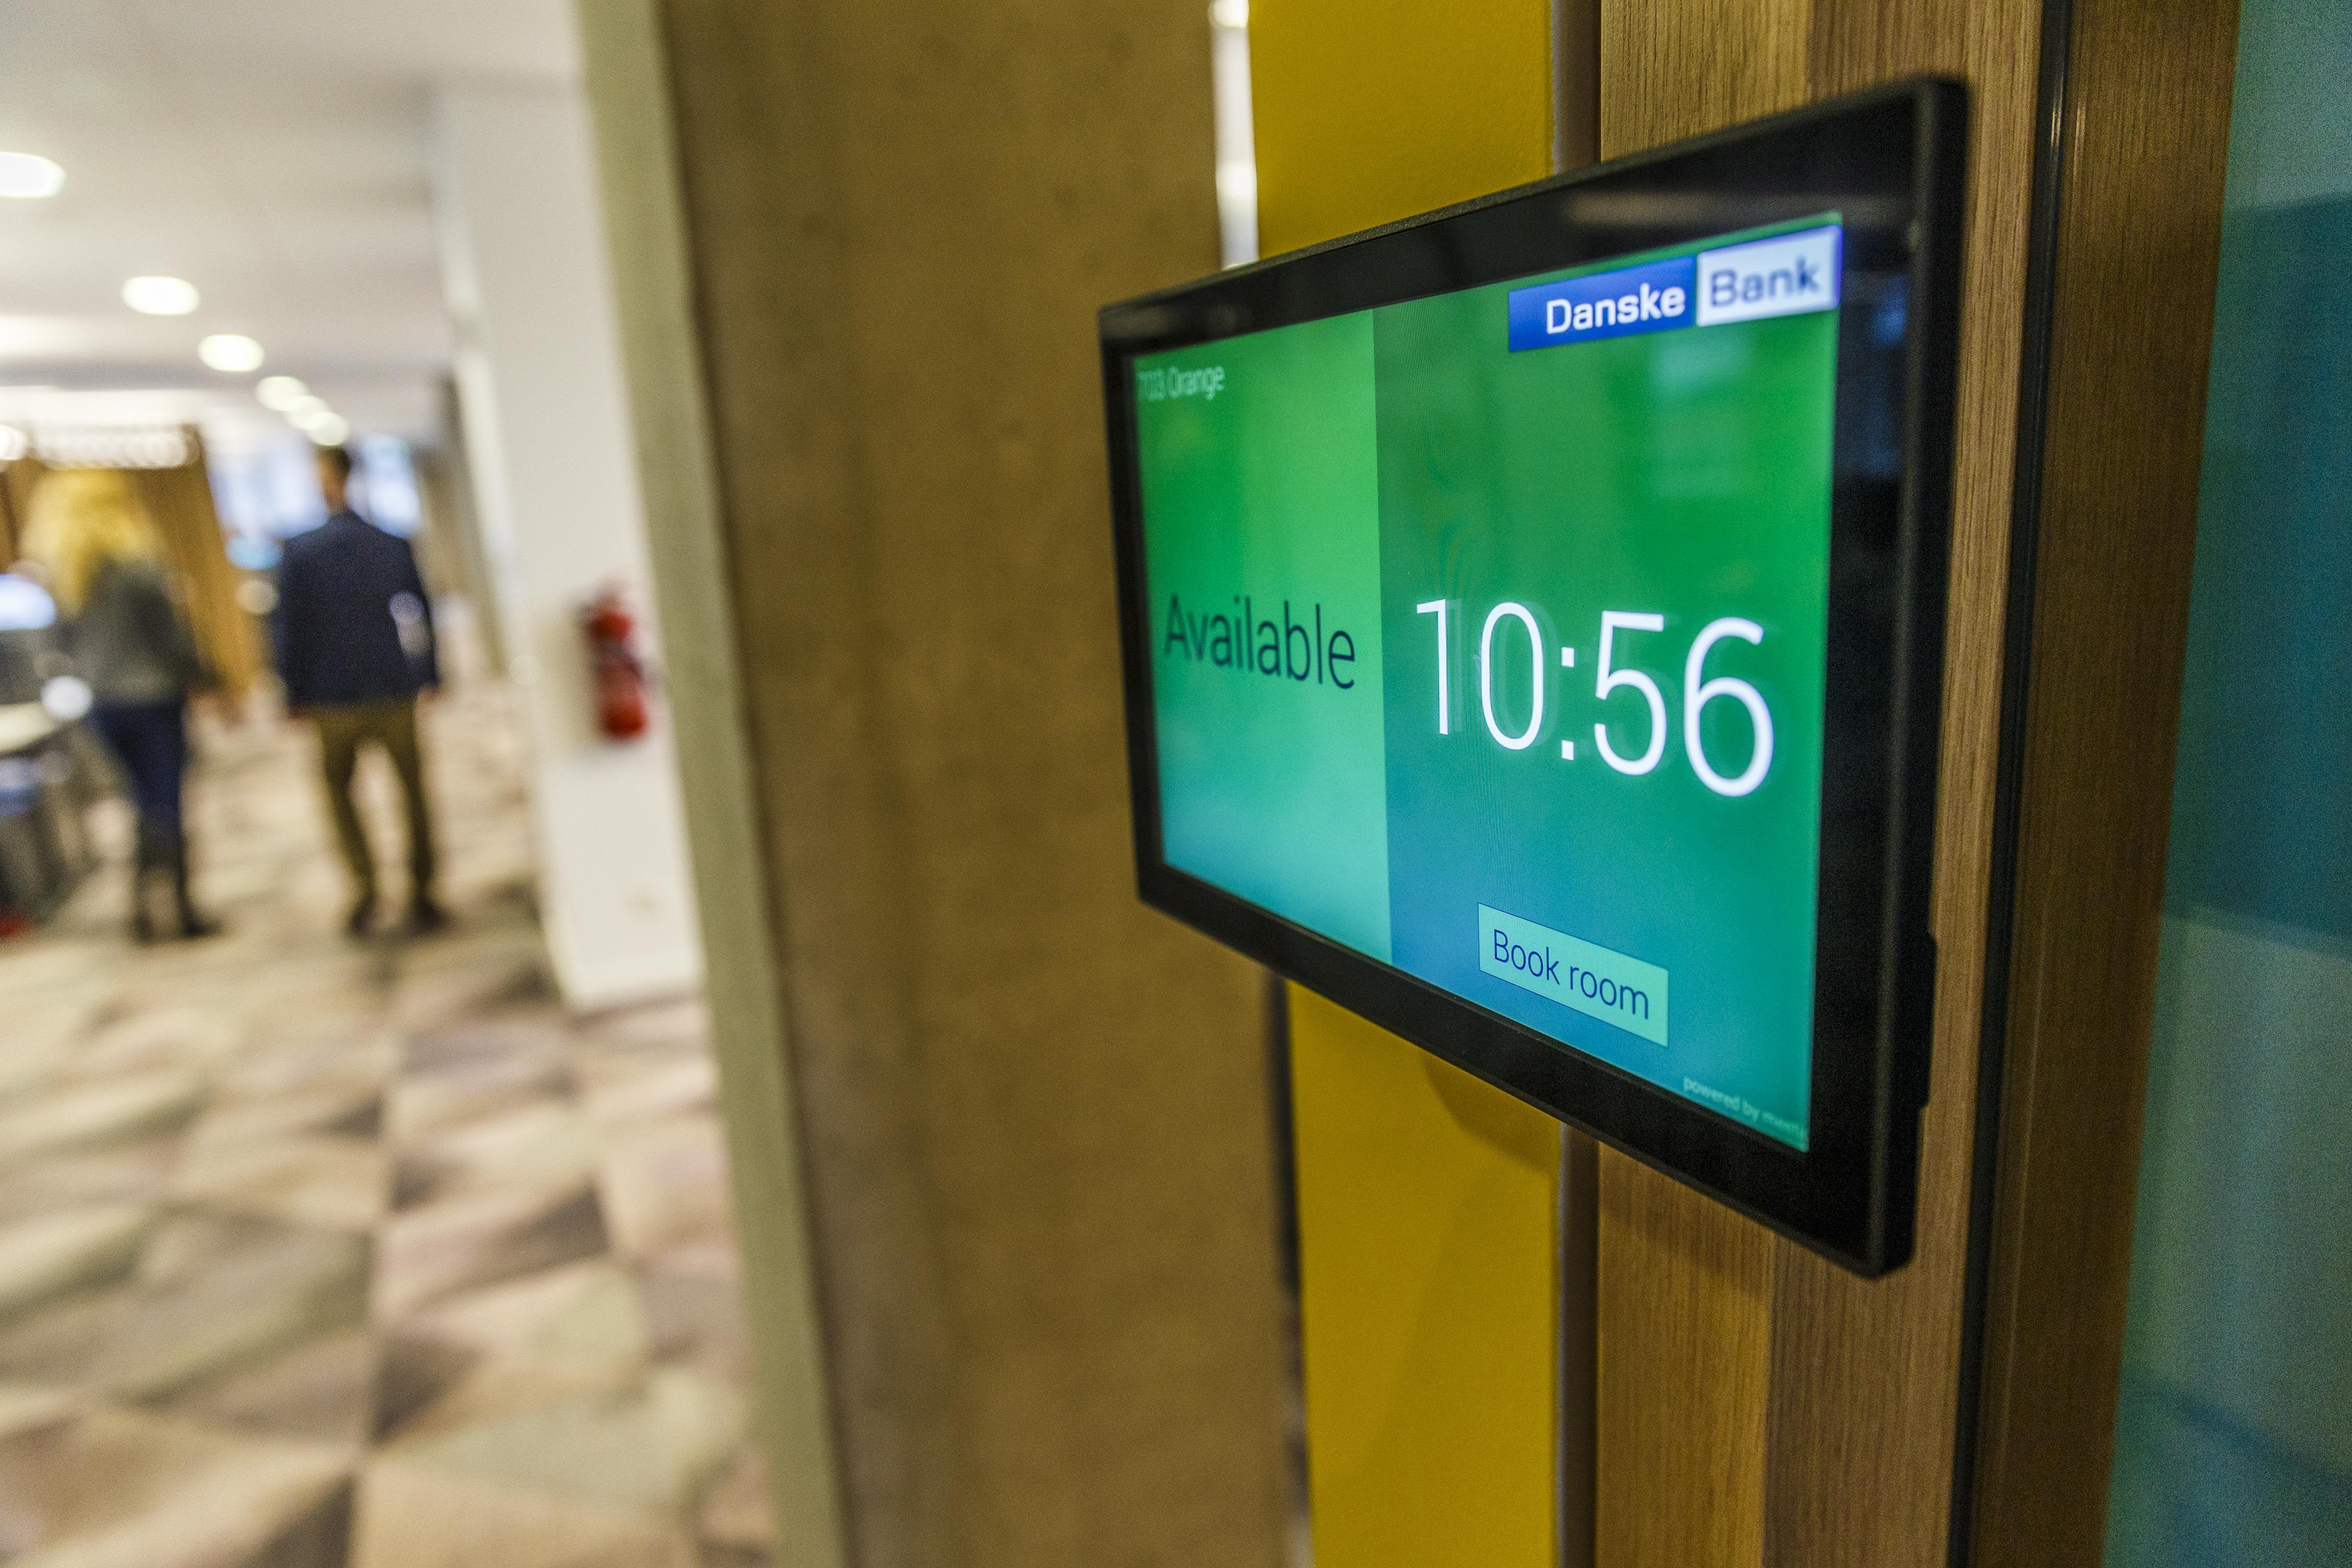 Dar vienas �Danske Bank��ir �Swedbank� sandoris:�atiduoda ir fondus